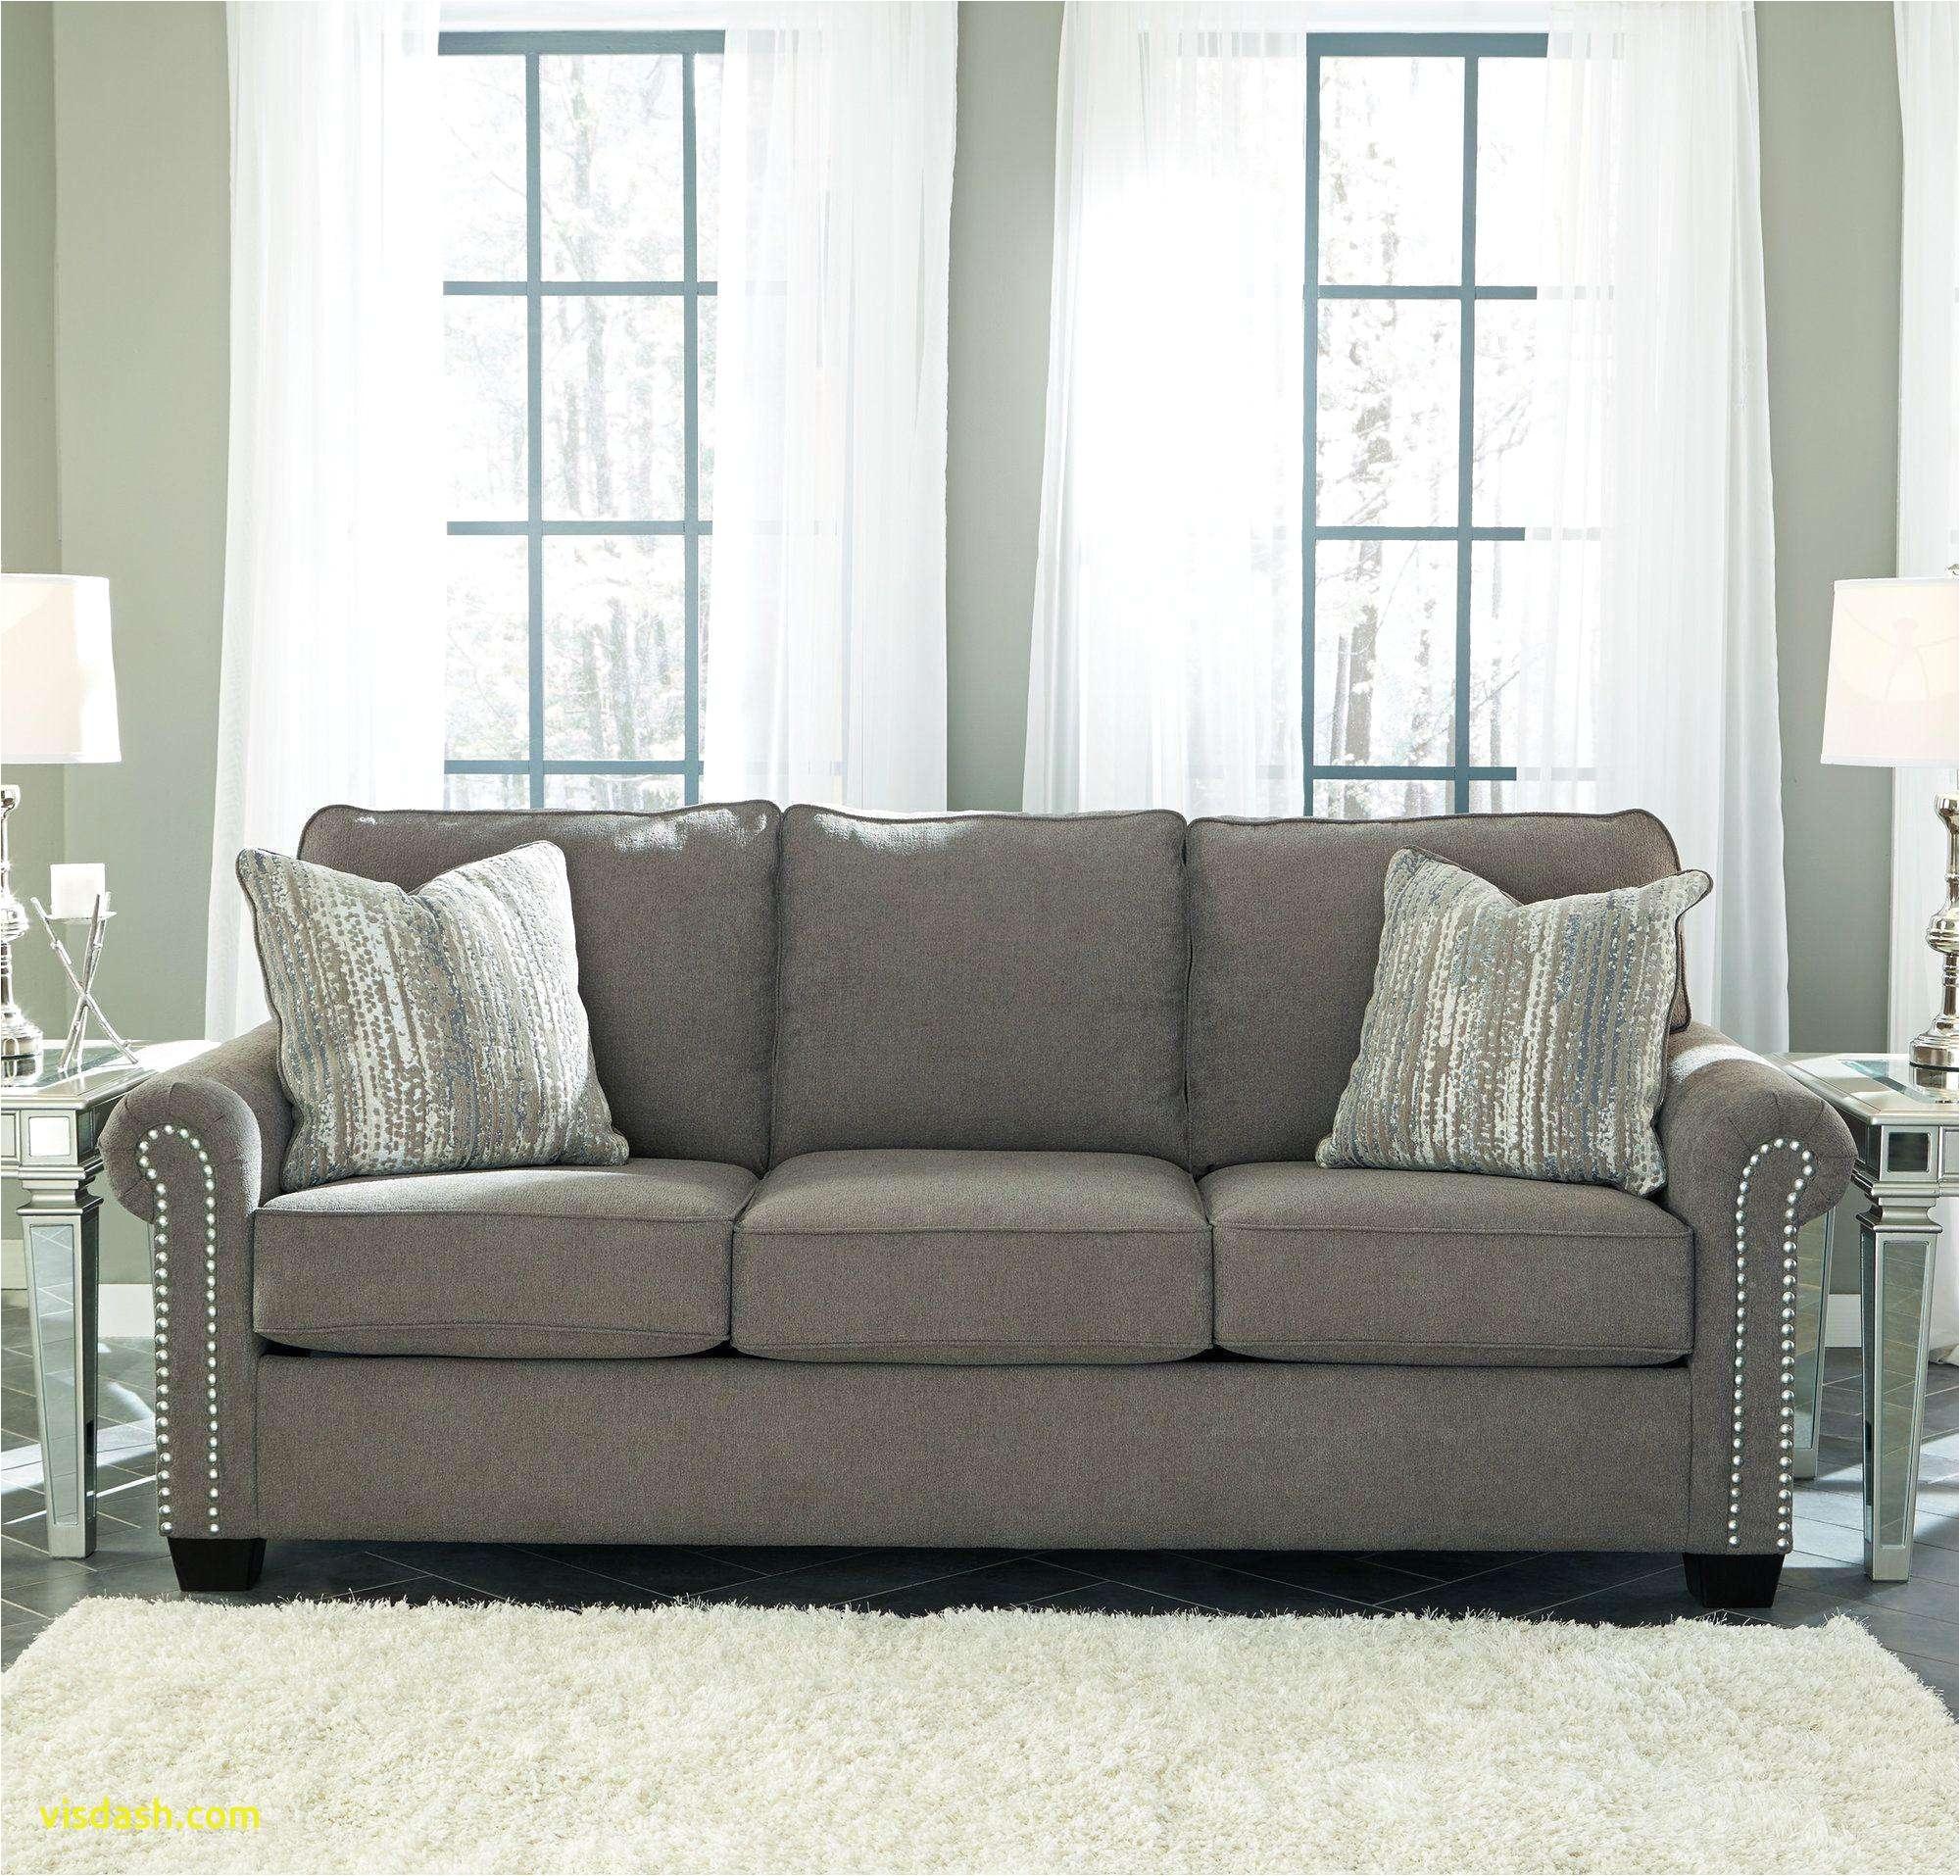 bedroom furniture birmingham al inspirational 50 elegant carlyle sofa bed graphics 50 s